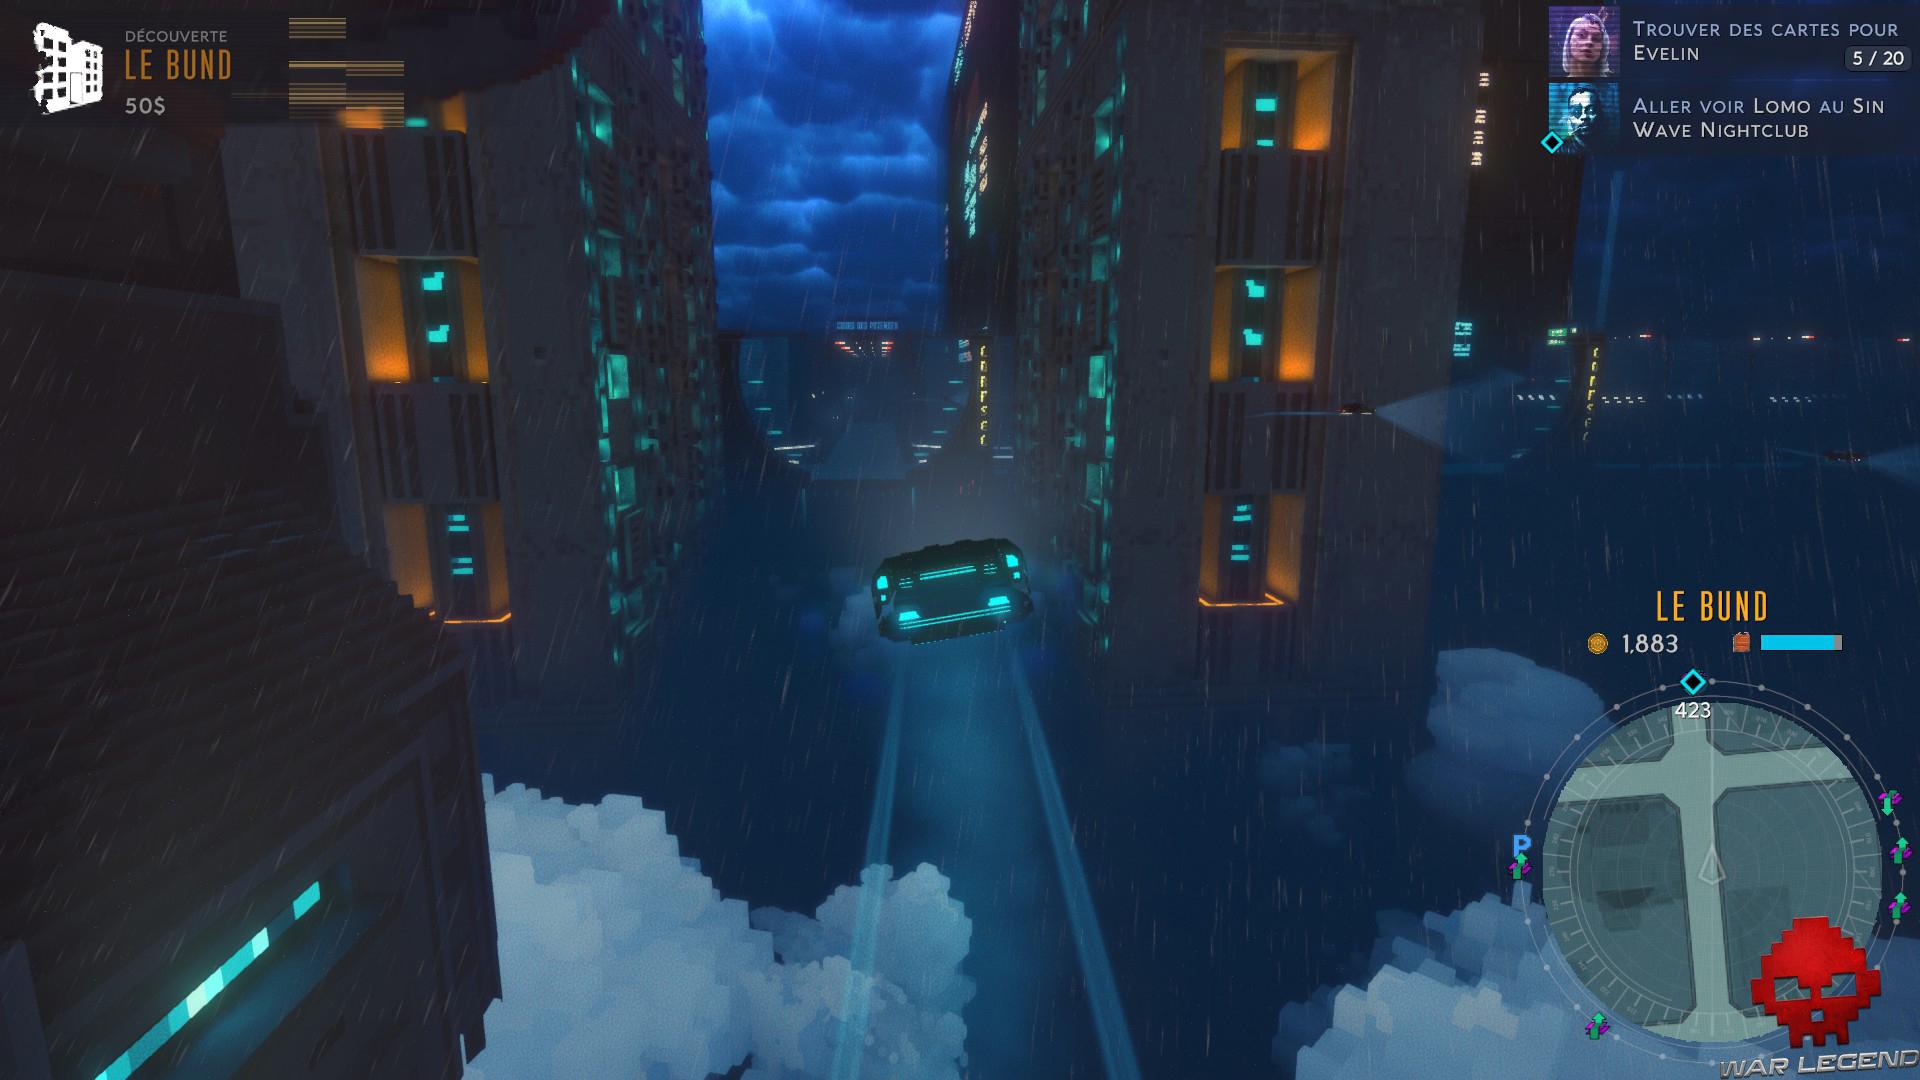 cloudpunk image